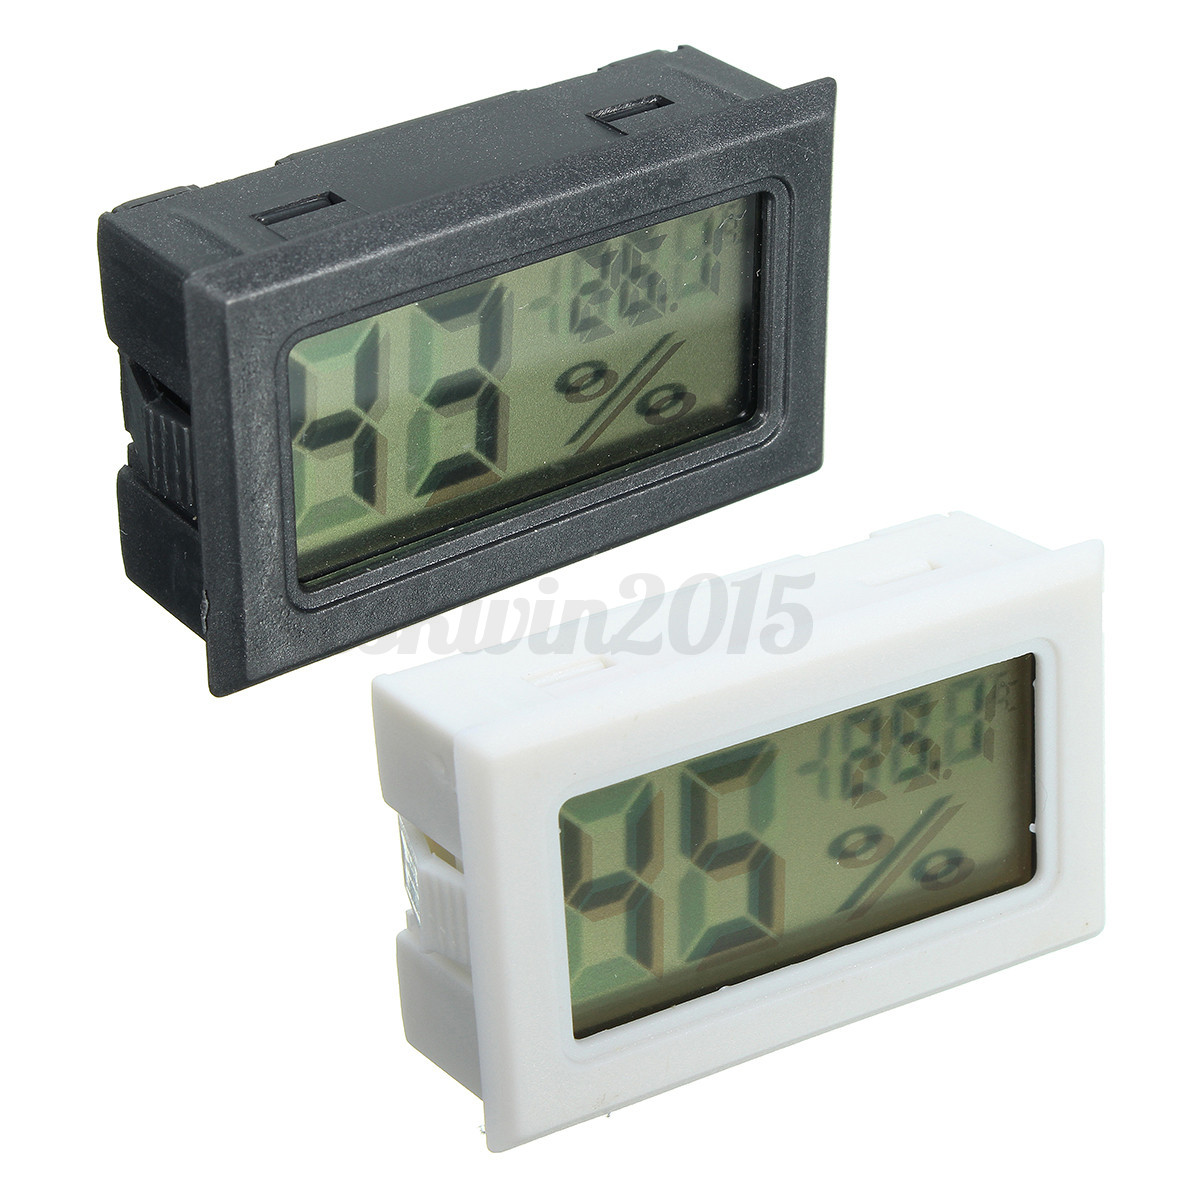 Digital Humidity Meter : Digital lcd cigar hygrometer thermometer humidity monitor